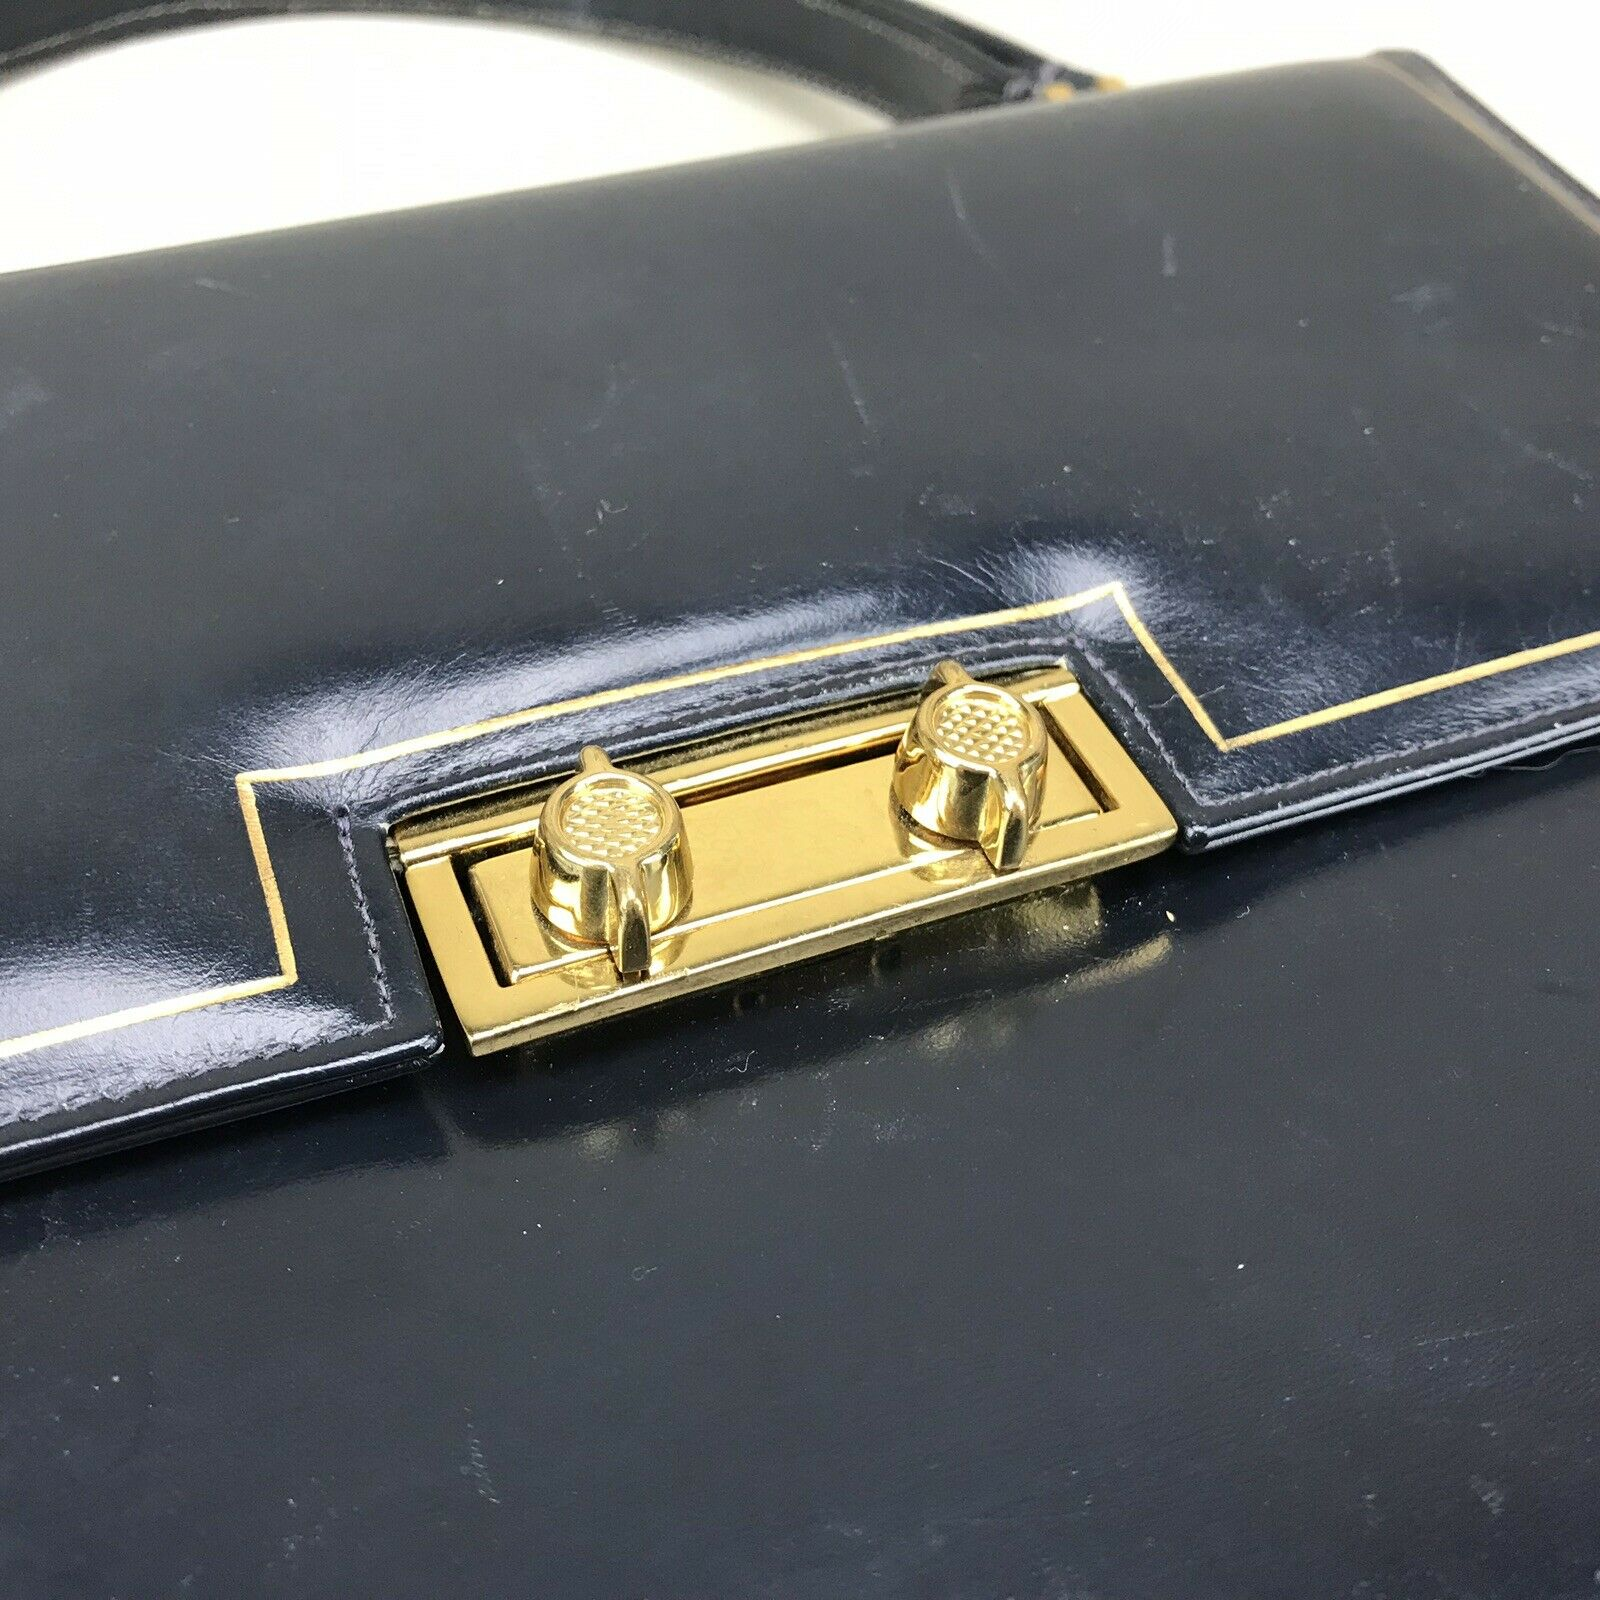 Scuola del Cuoio Vintage 1950s Purse Blue Gold Em… - image 4